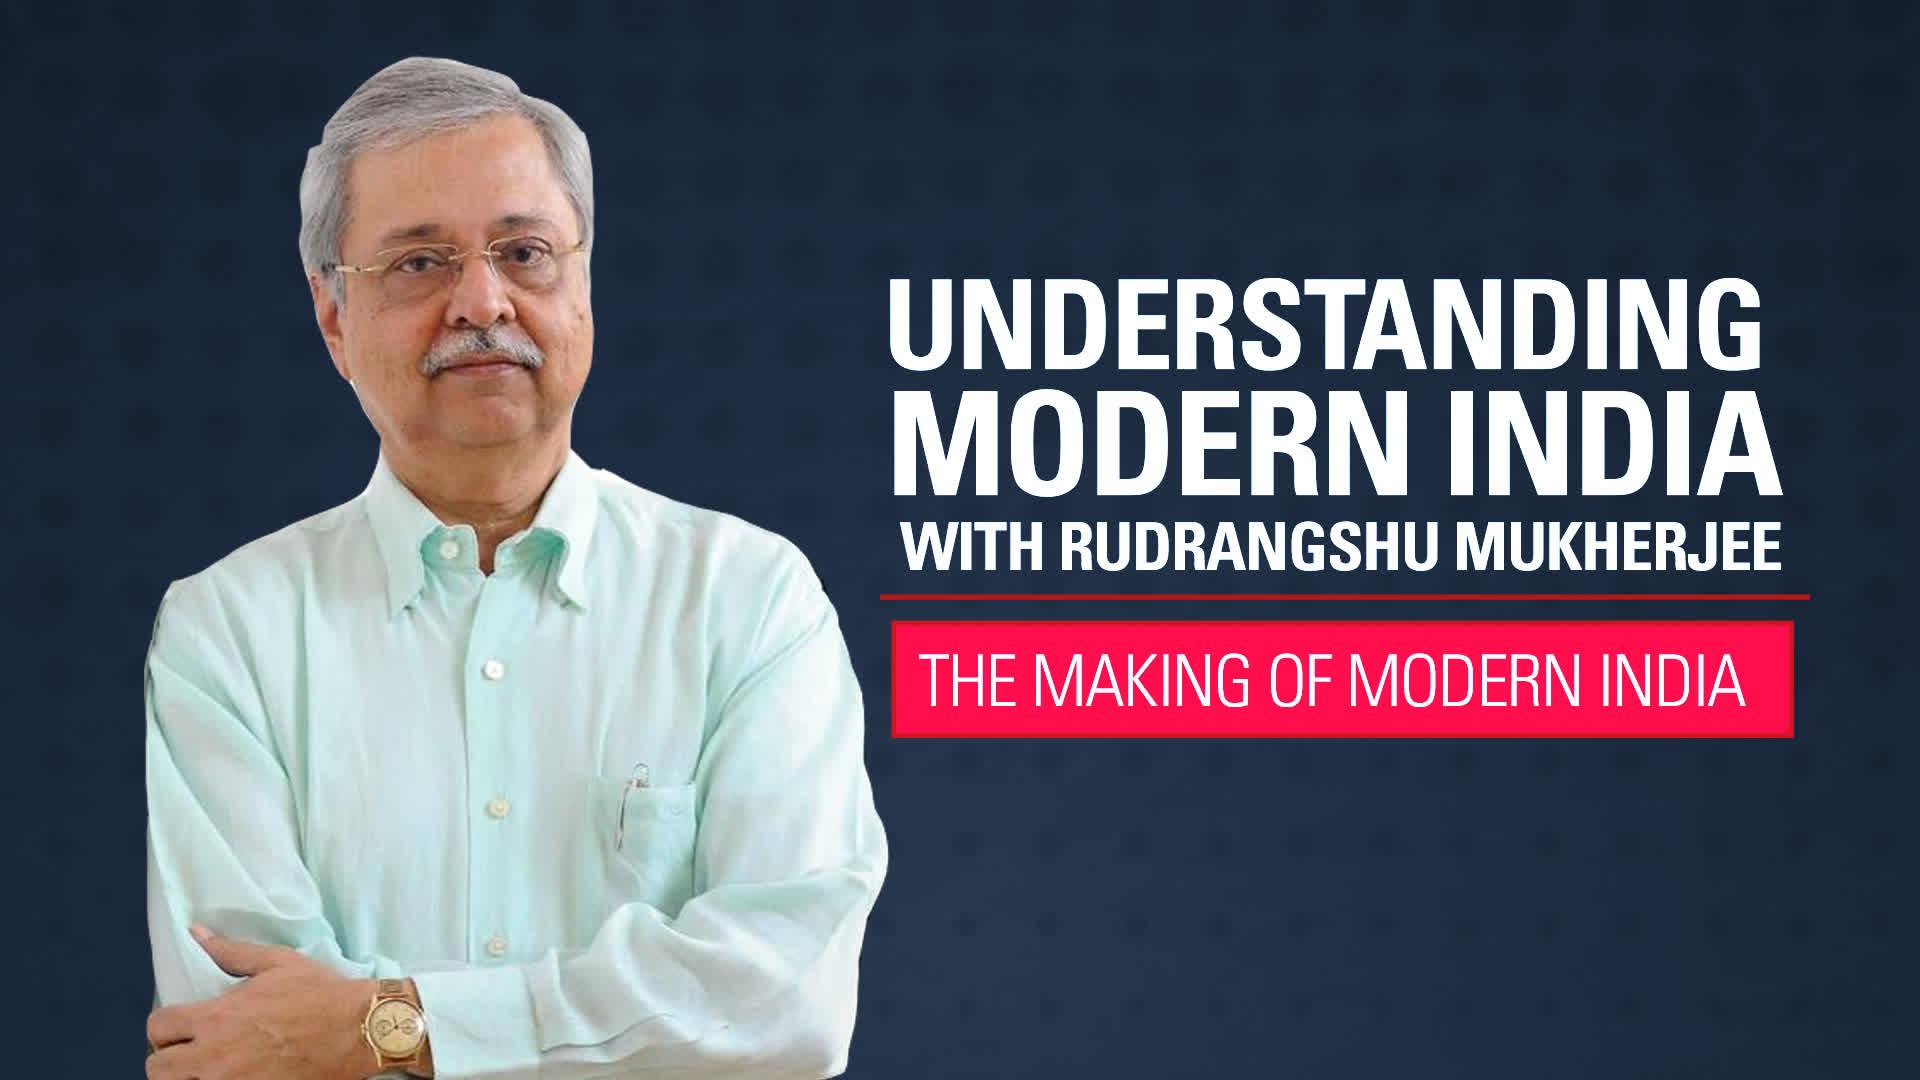 Understanding Modern India with Rudrangshu Mukherjee